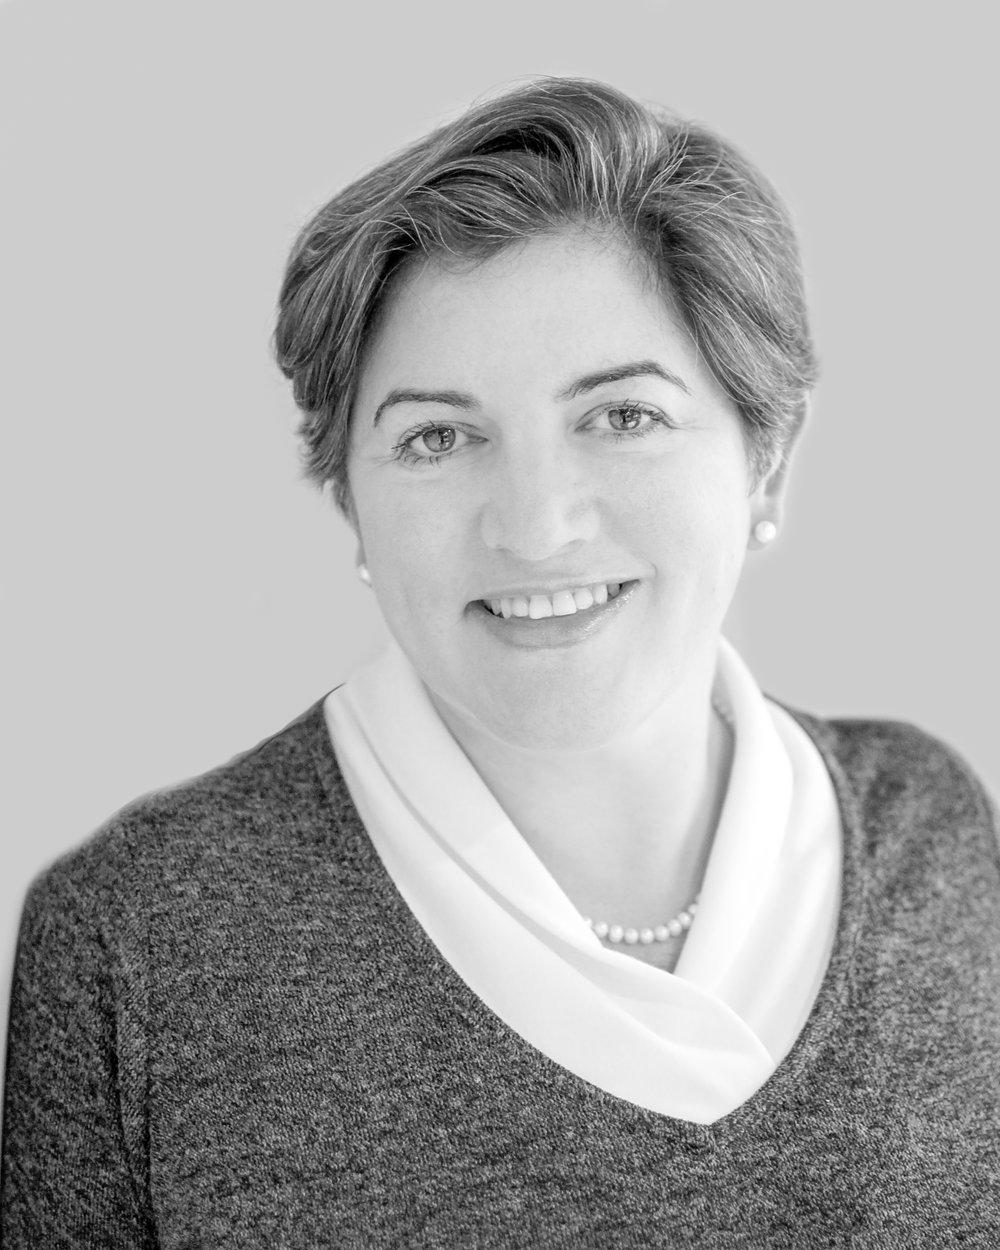 KEYNOTE Magistrate Judge Paula McCandlis - Role of ADR in bridging community divides